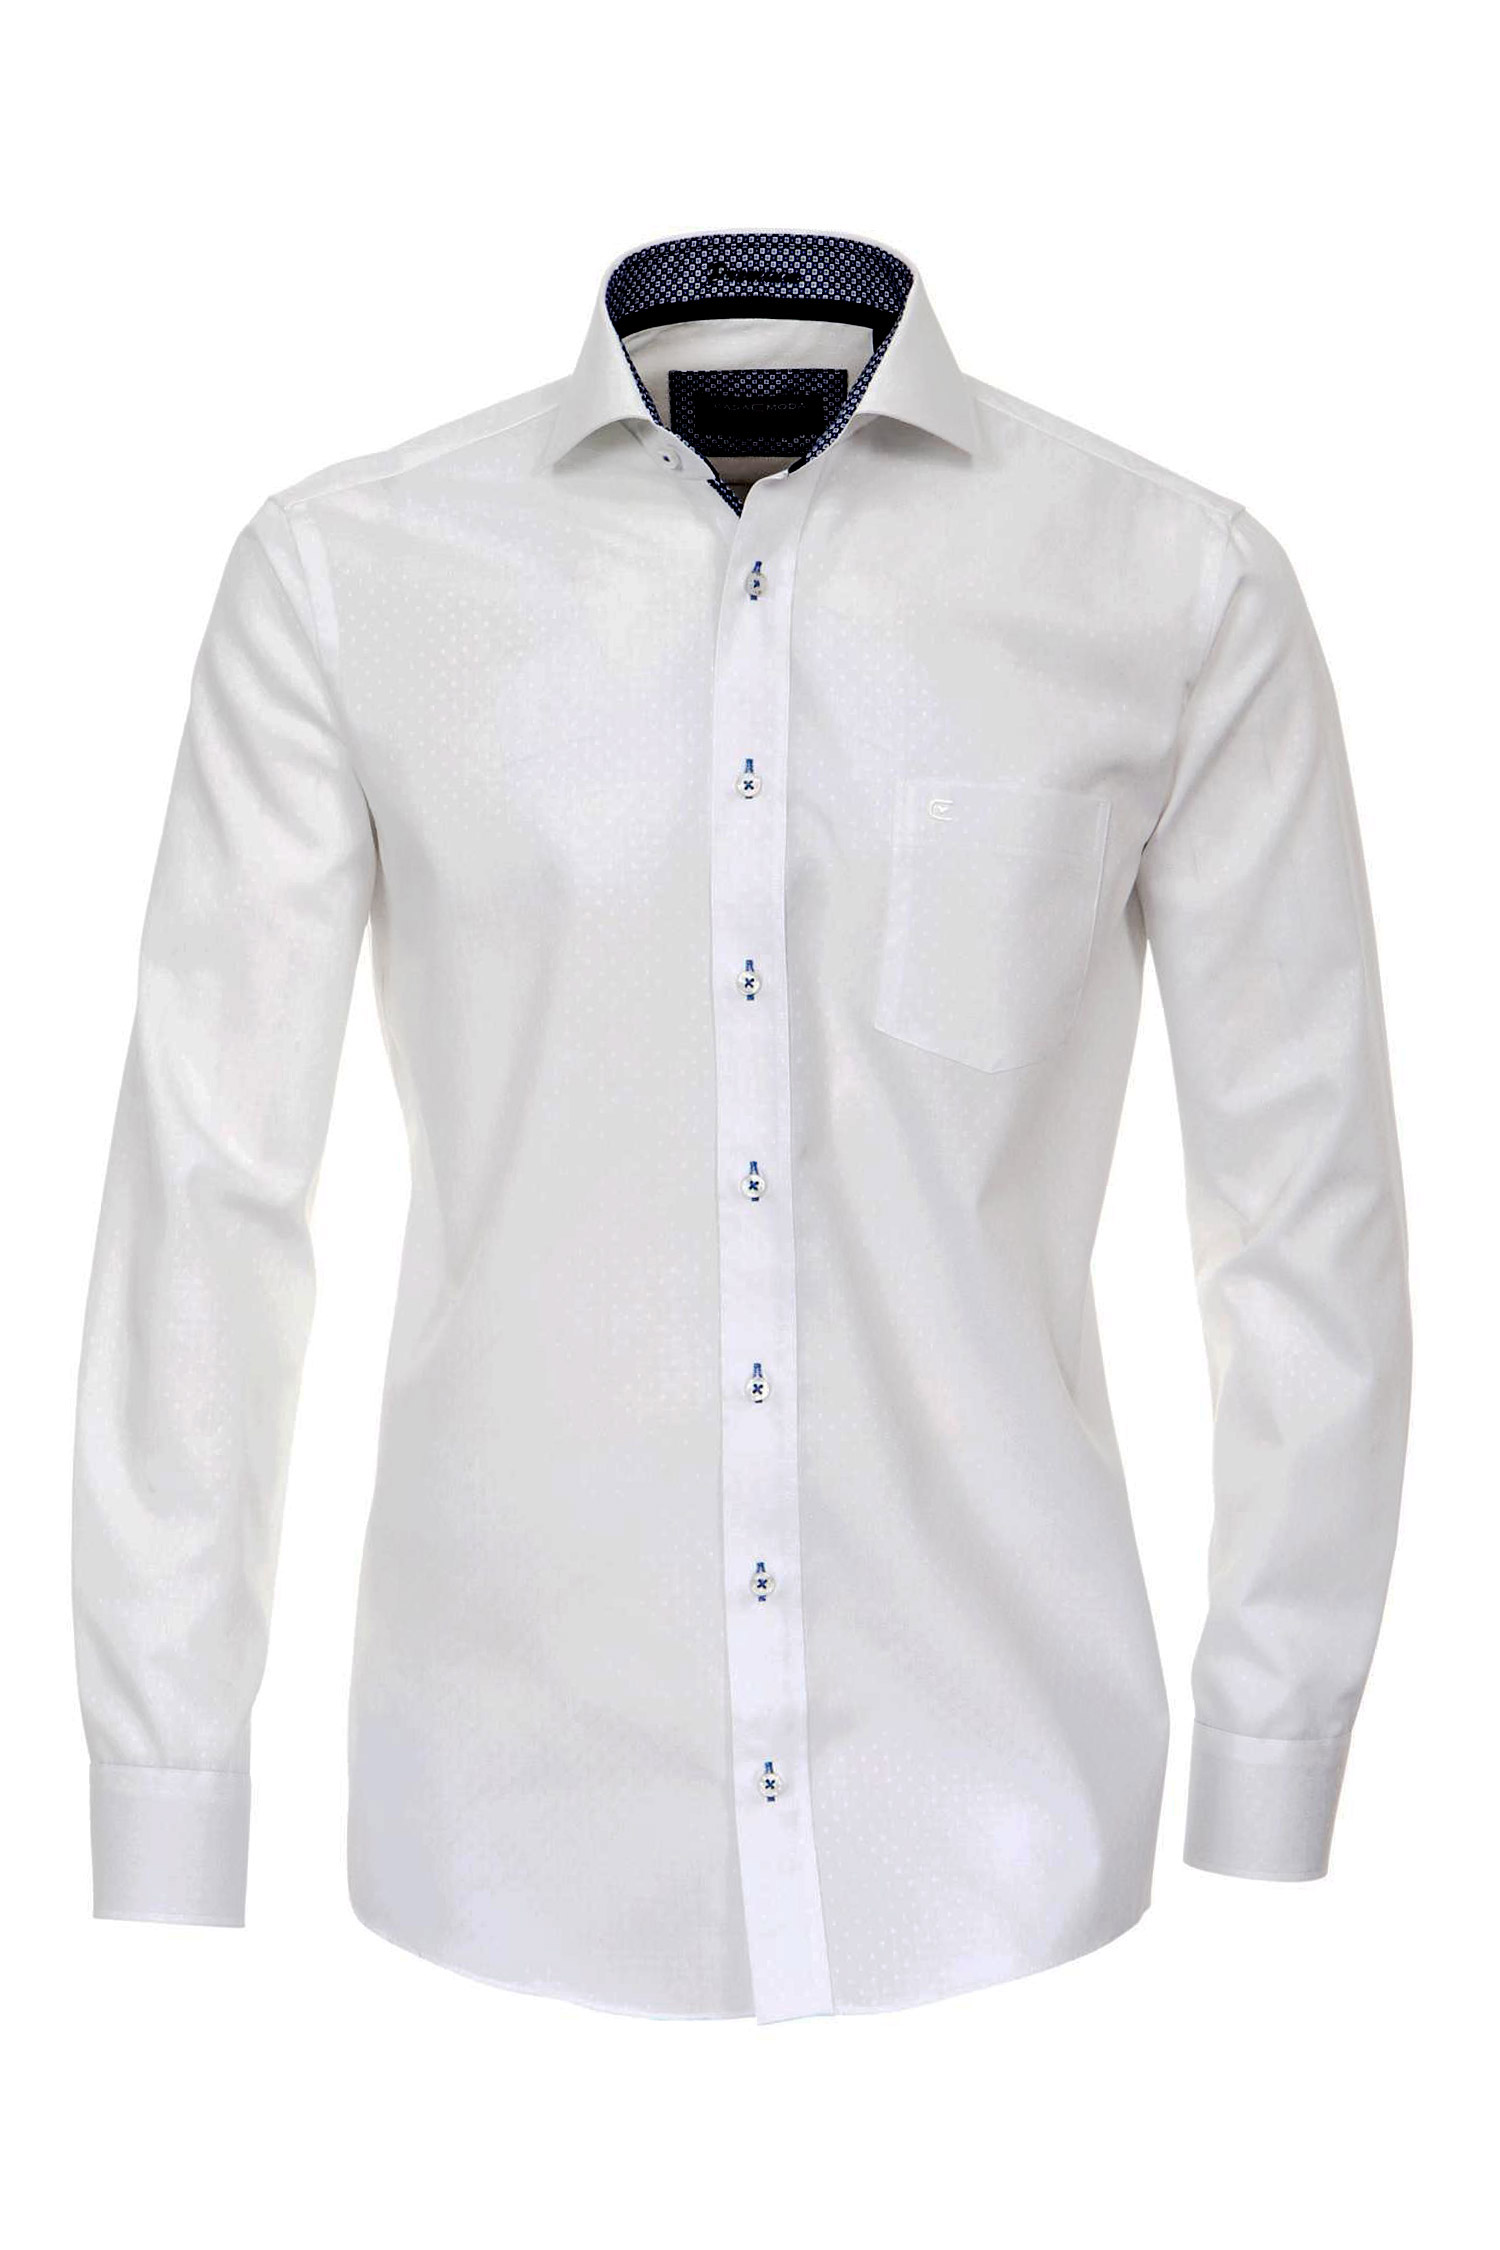 Camisas, Vestir Manga Larga, 108930, CELESTE | Zoom